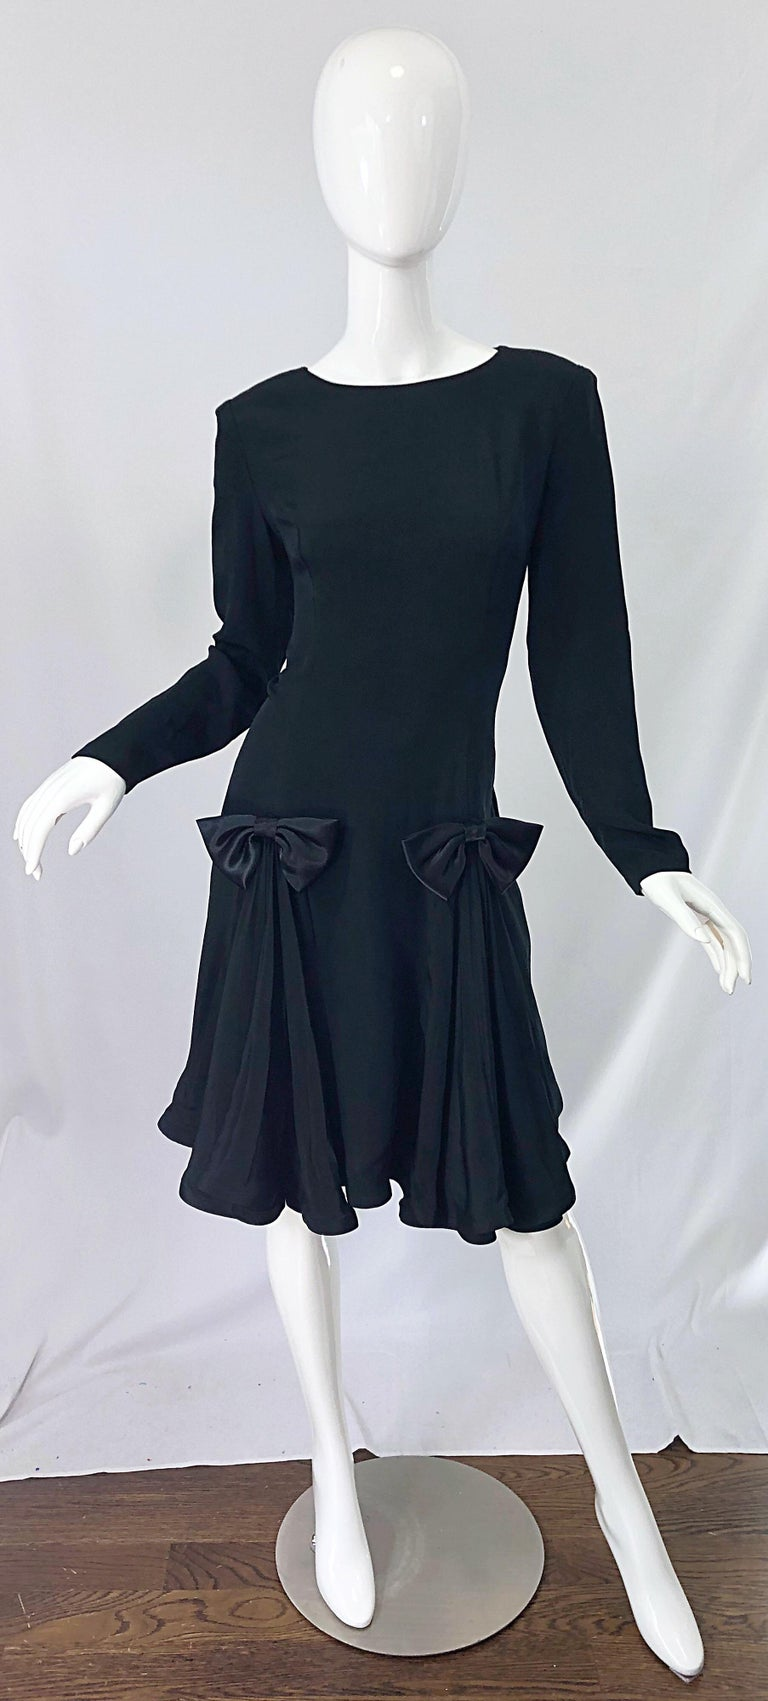 Vintage Pierre Cardin Size 8 Black Silk 1990s Long Sleeve 90s Bow Dress For Sale 8